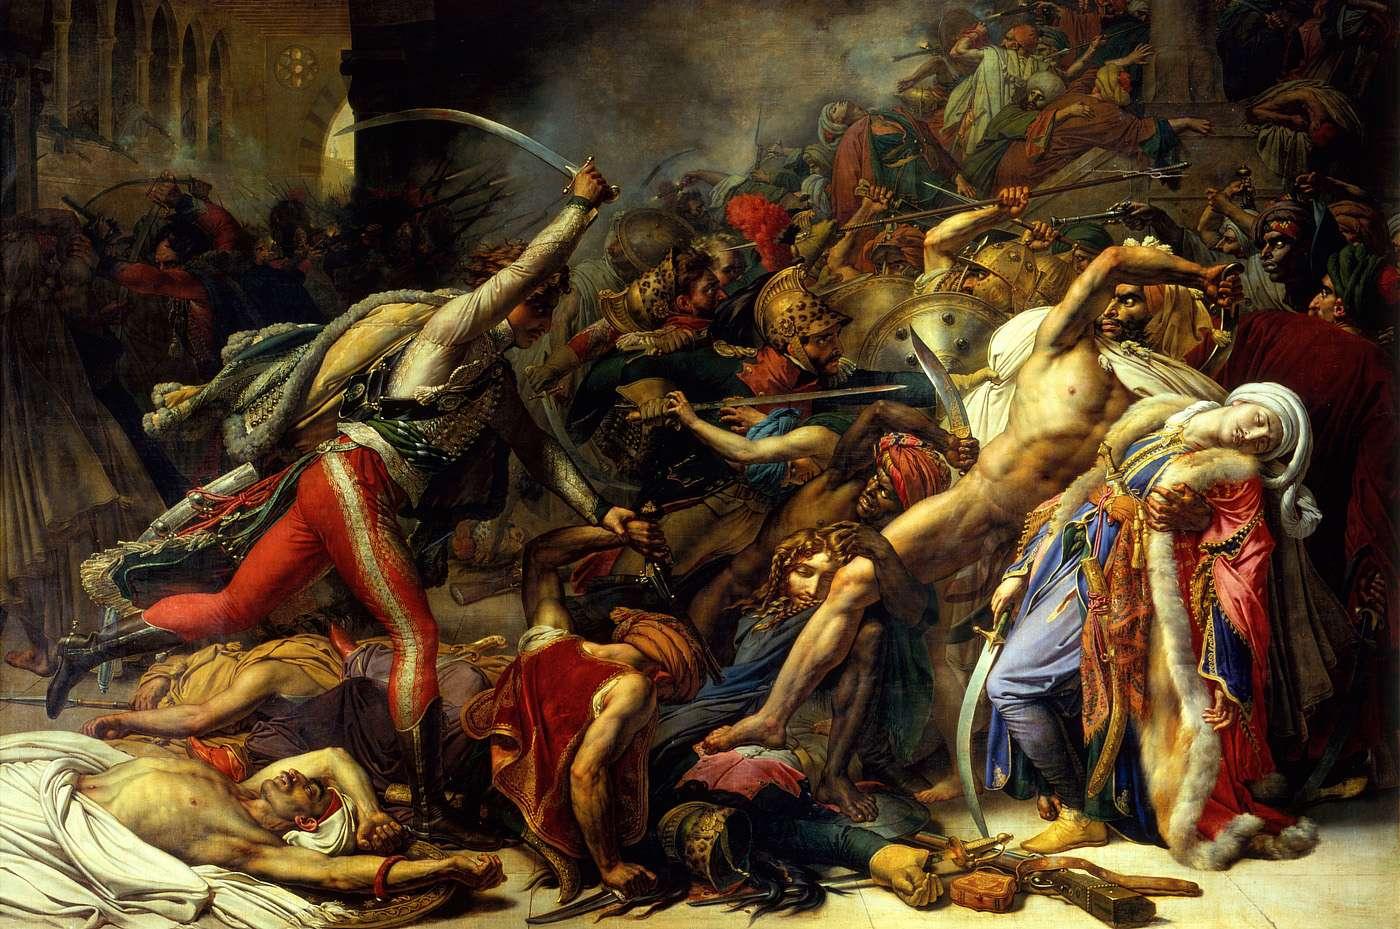 vers79_girodet_cairo-revolt